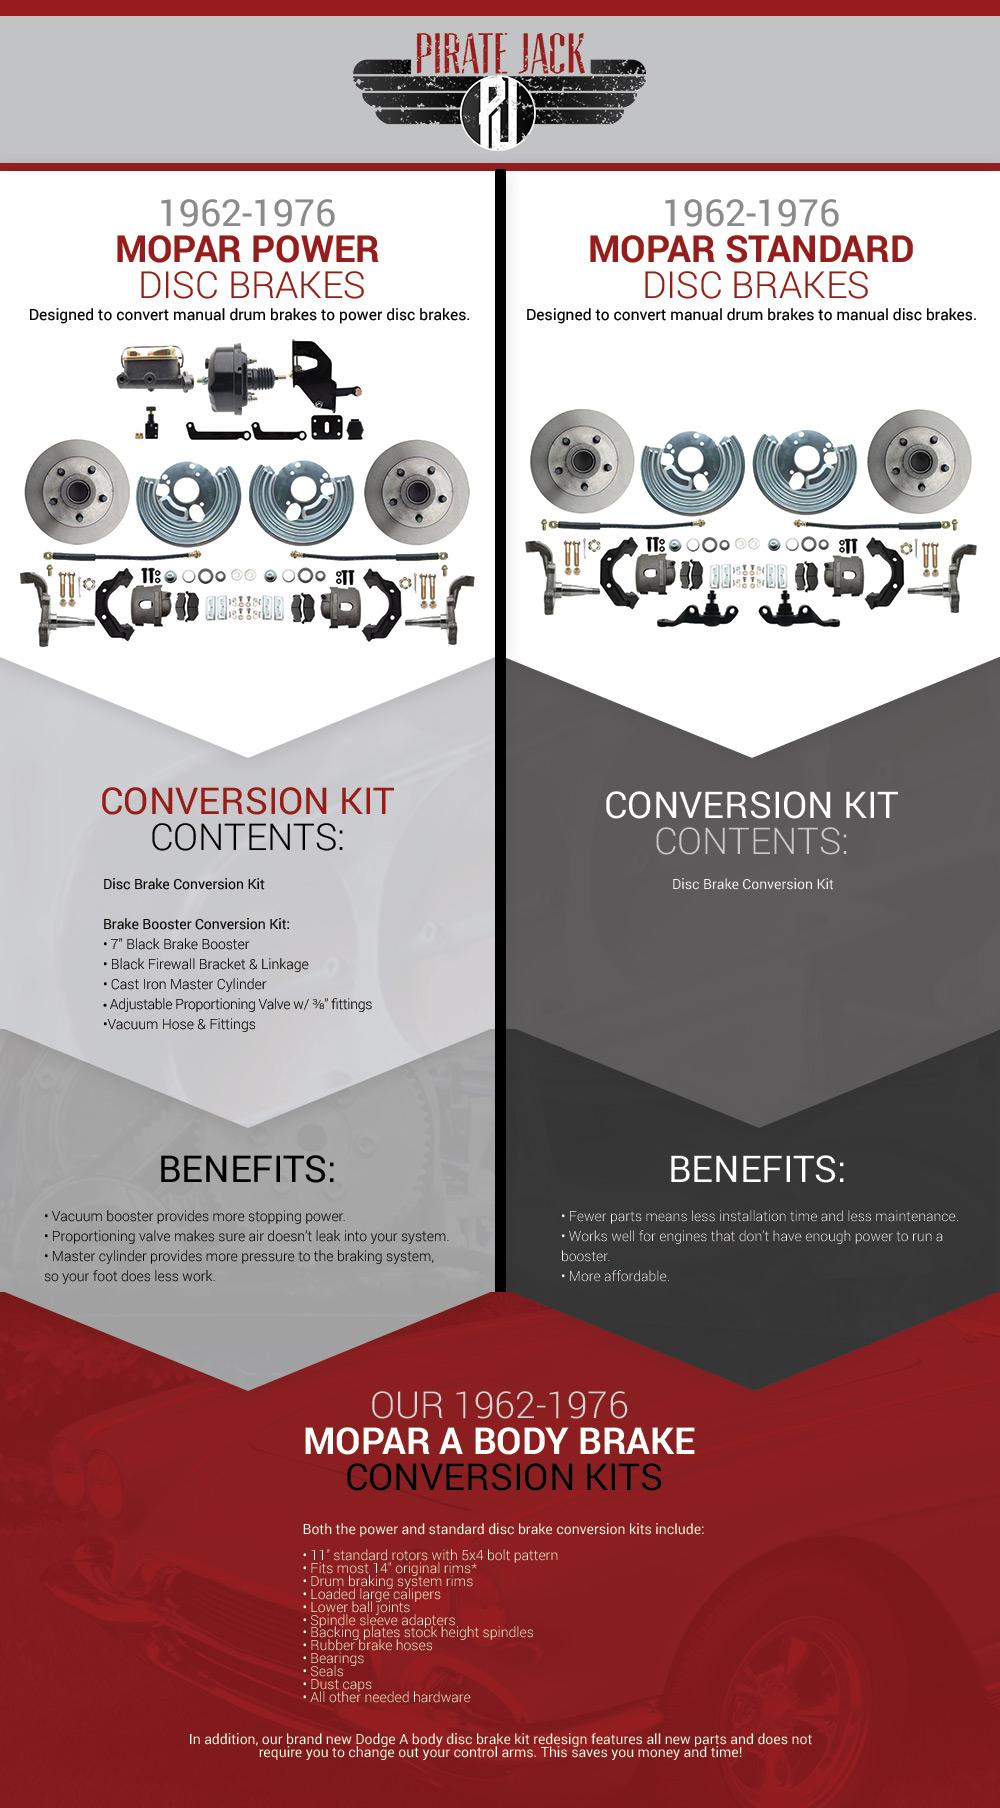 Mopar A Body Disc Brake Conversions: Power vs  Standard